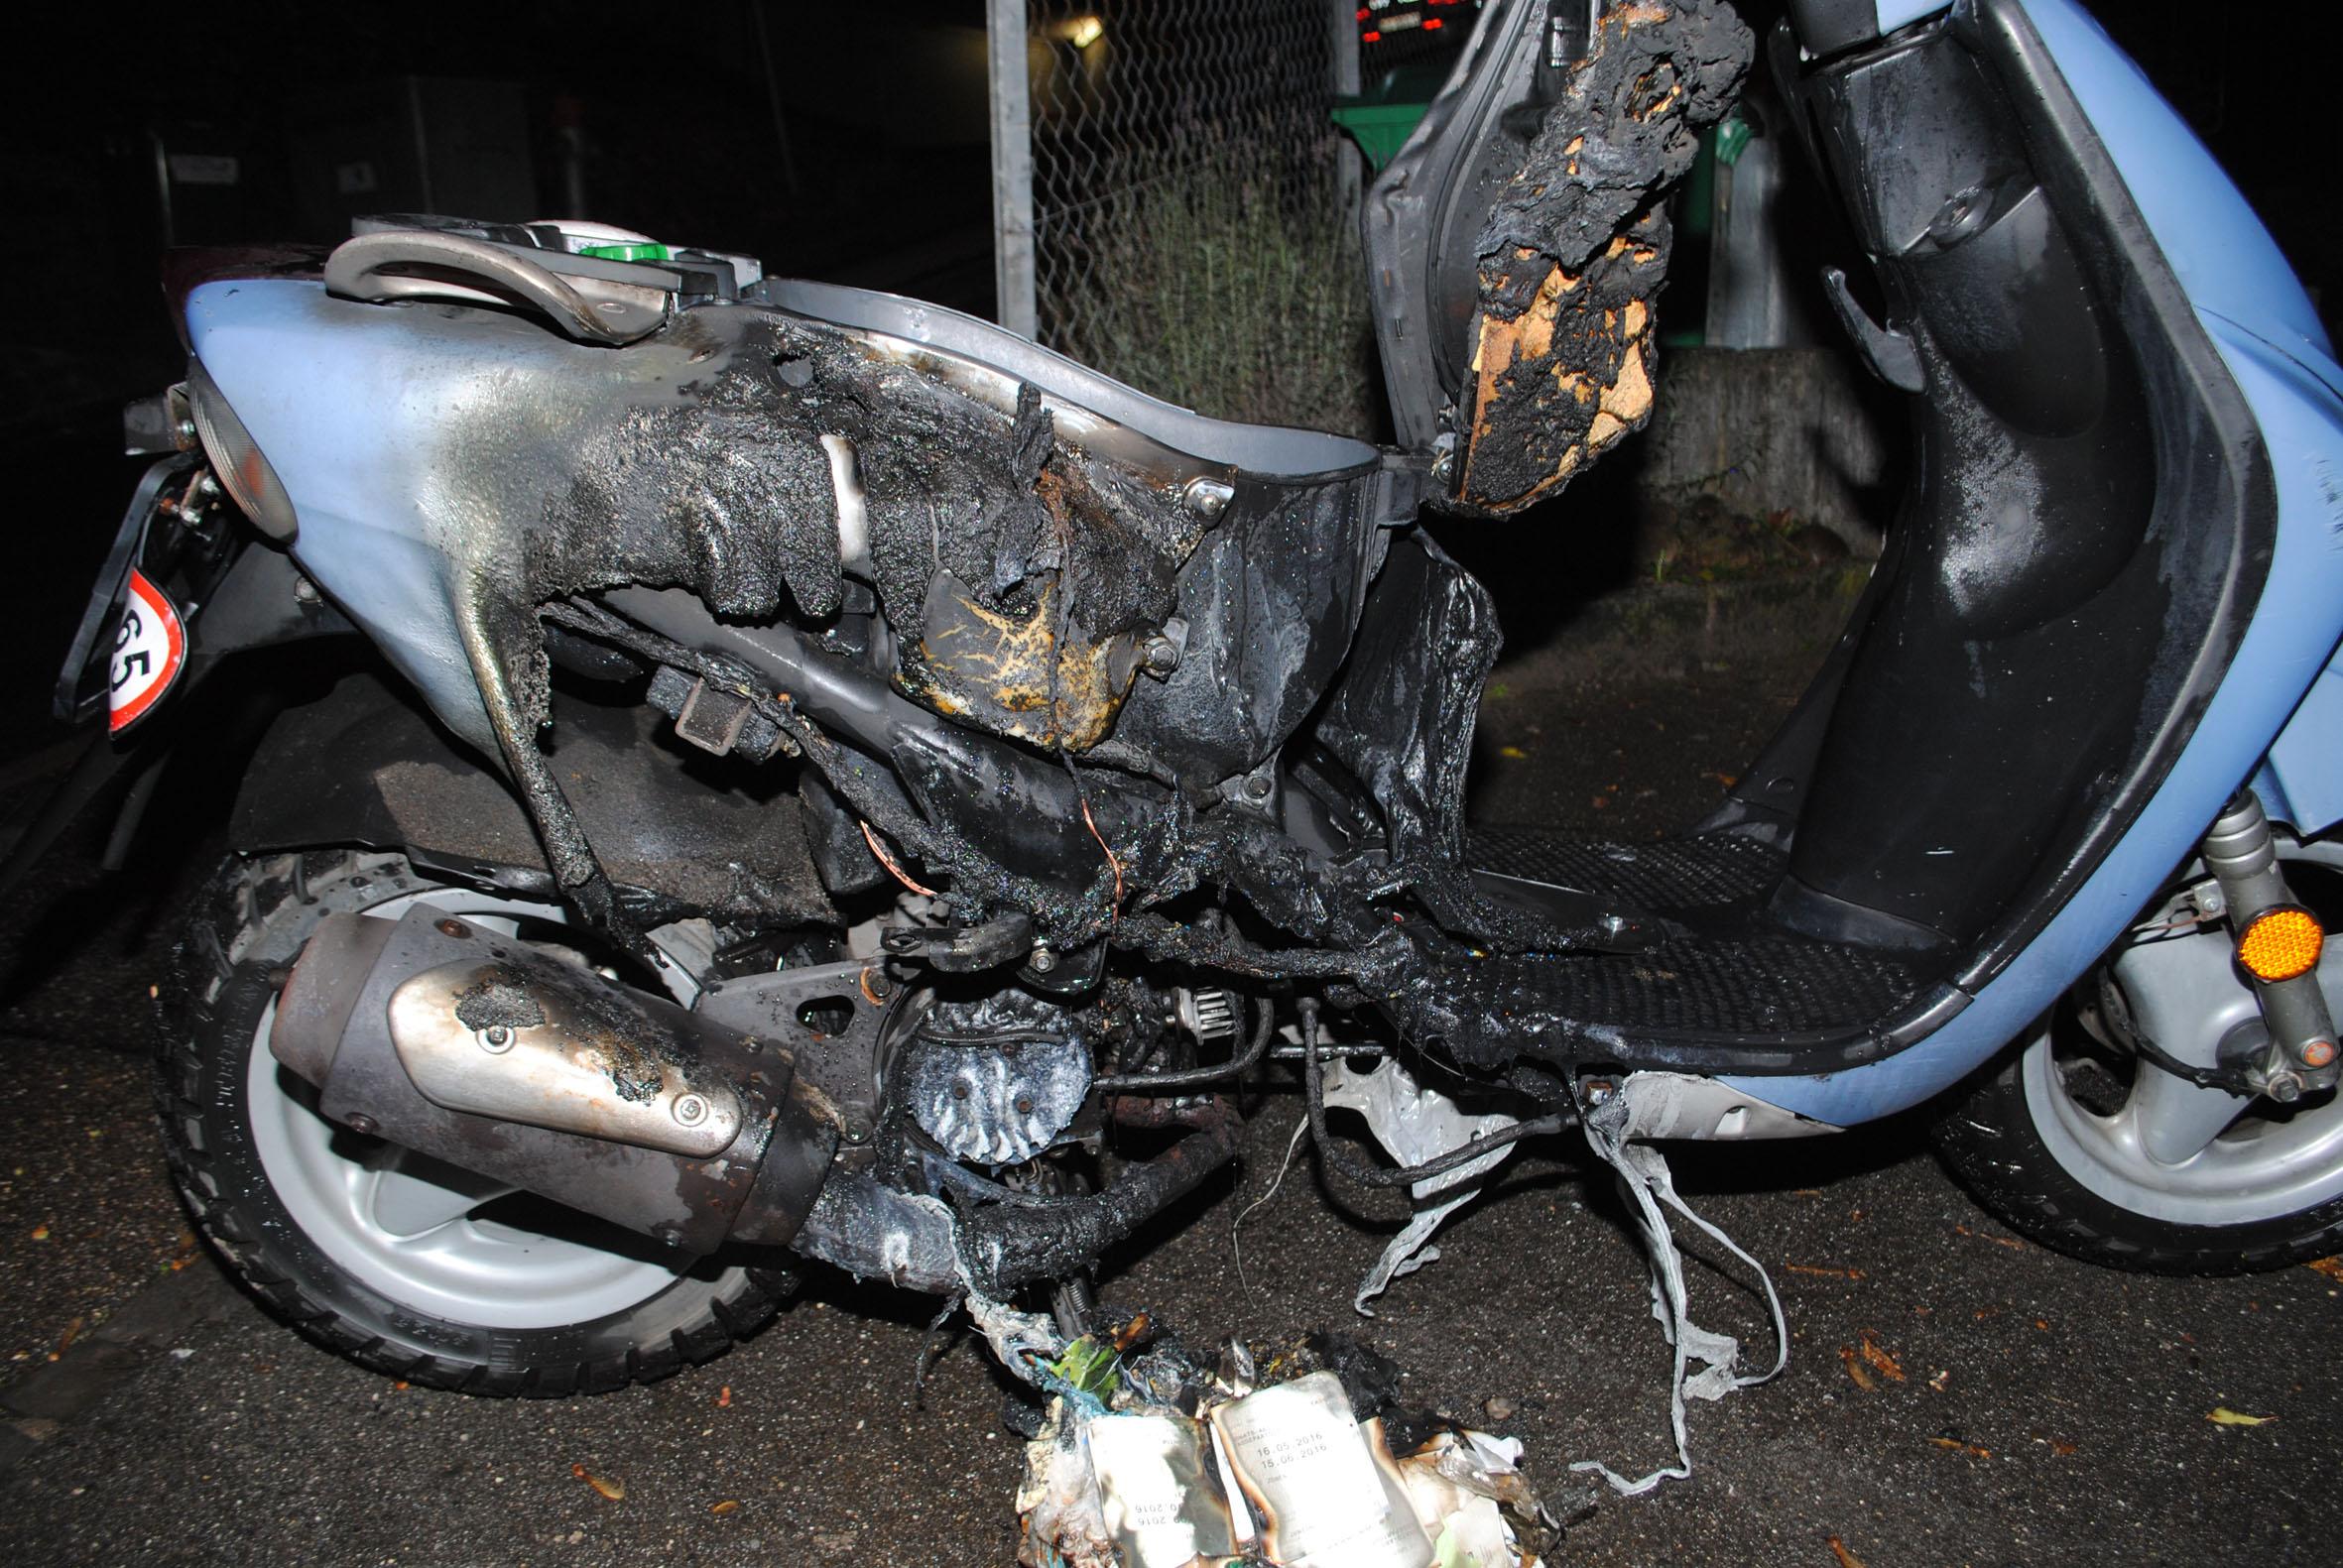 Motorrad in Brand gesteckt